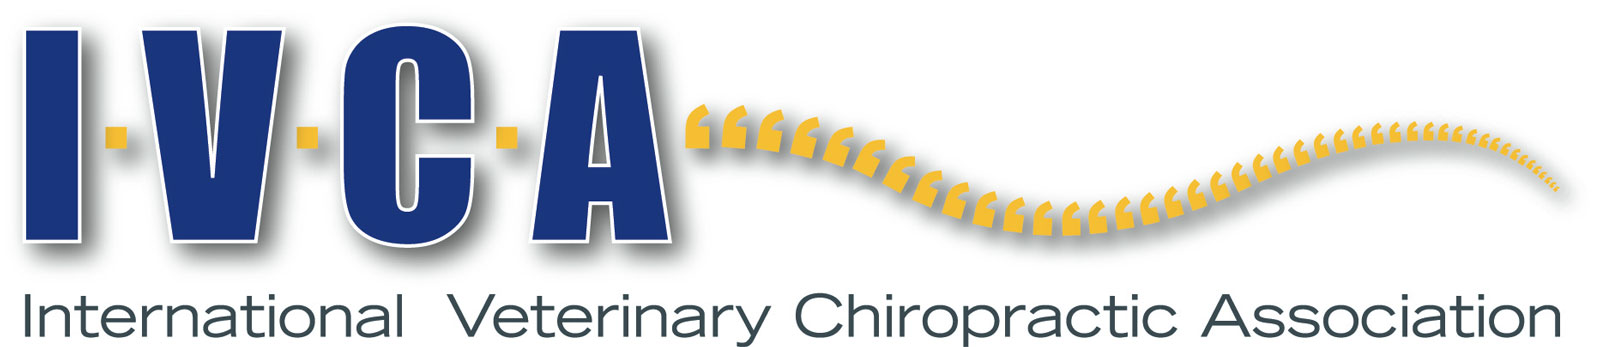 IVCA_Brief-Logo_web.jpg